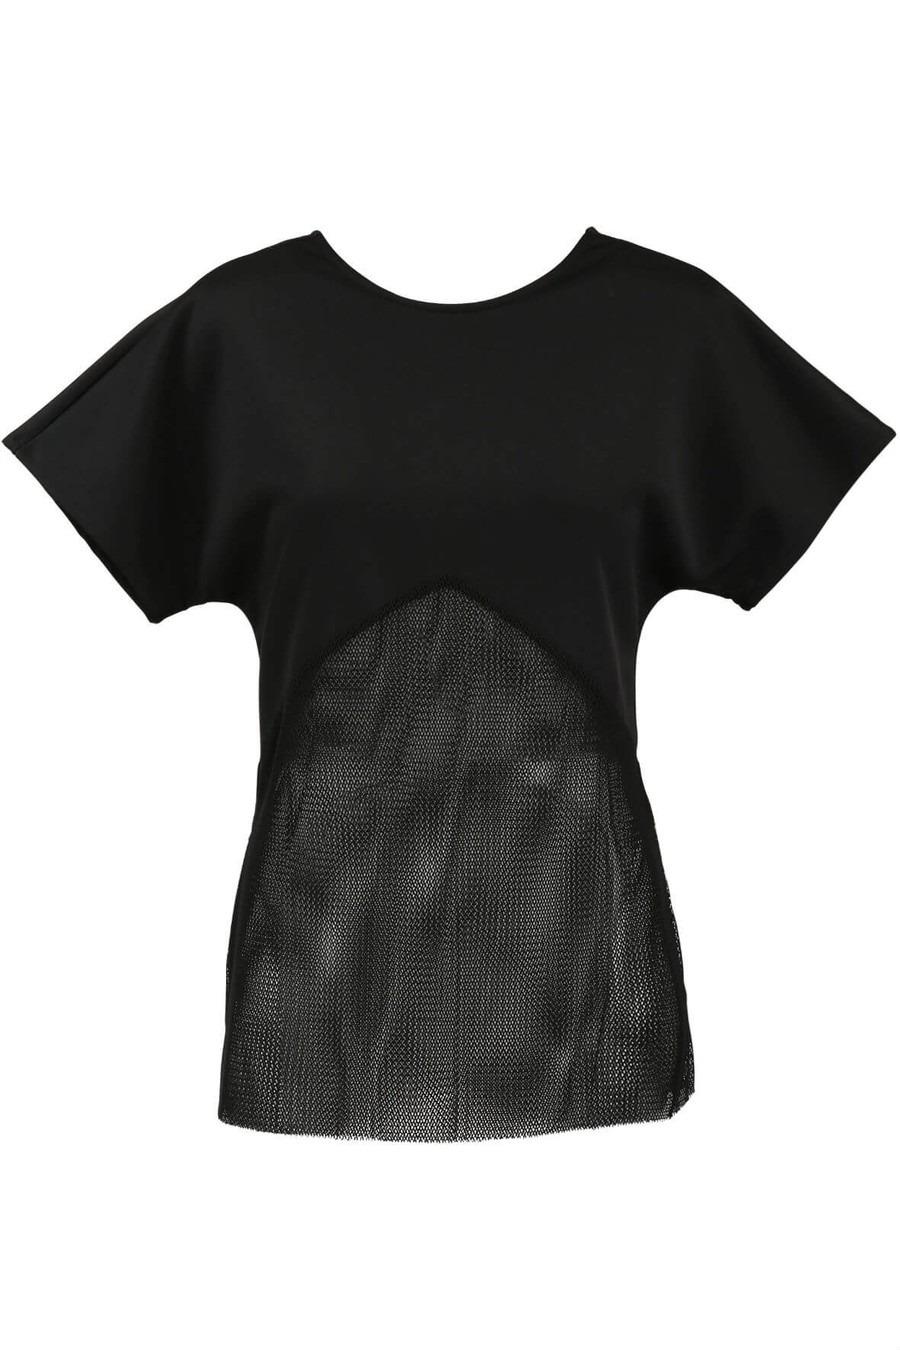 maepang-short-sleeve-straight-cut-hexagon-tee-black-1